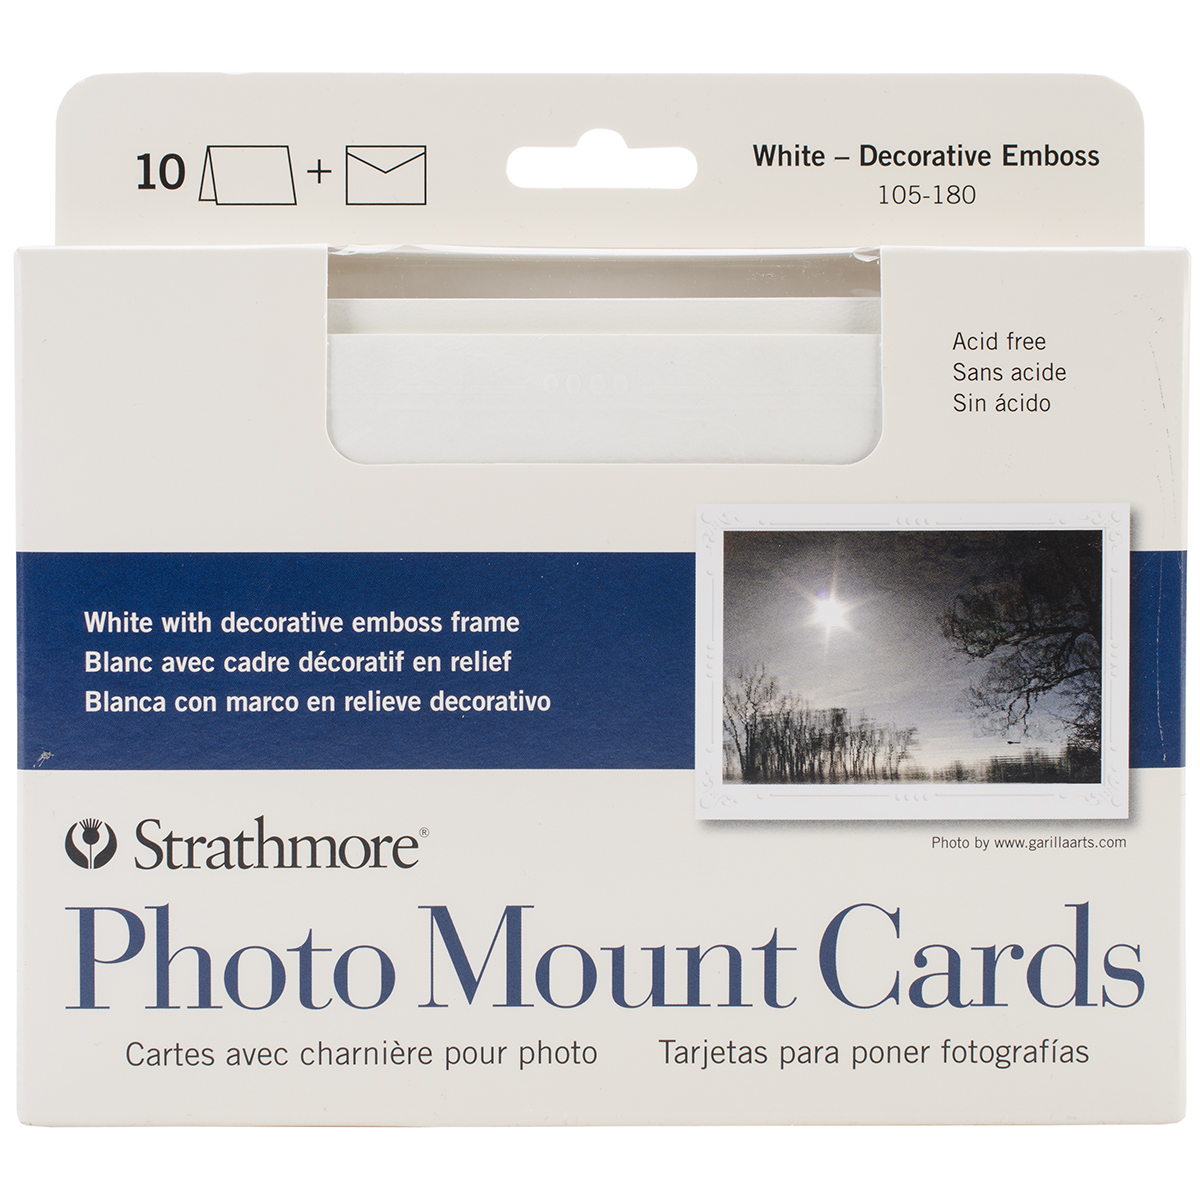 Strathmore Photo Mount Cards & Envelopes